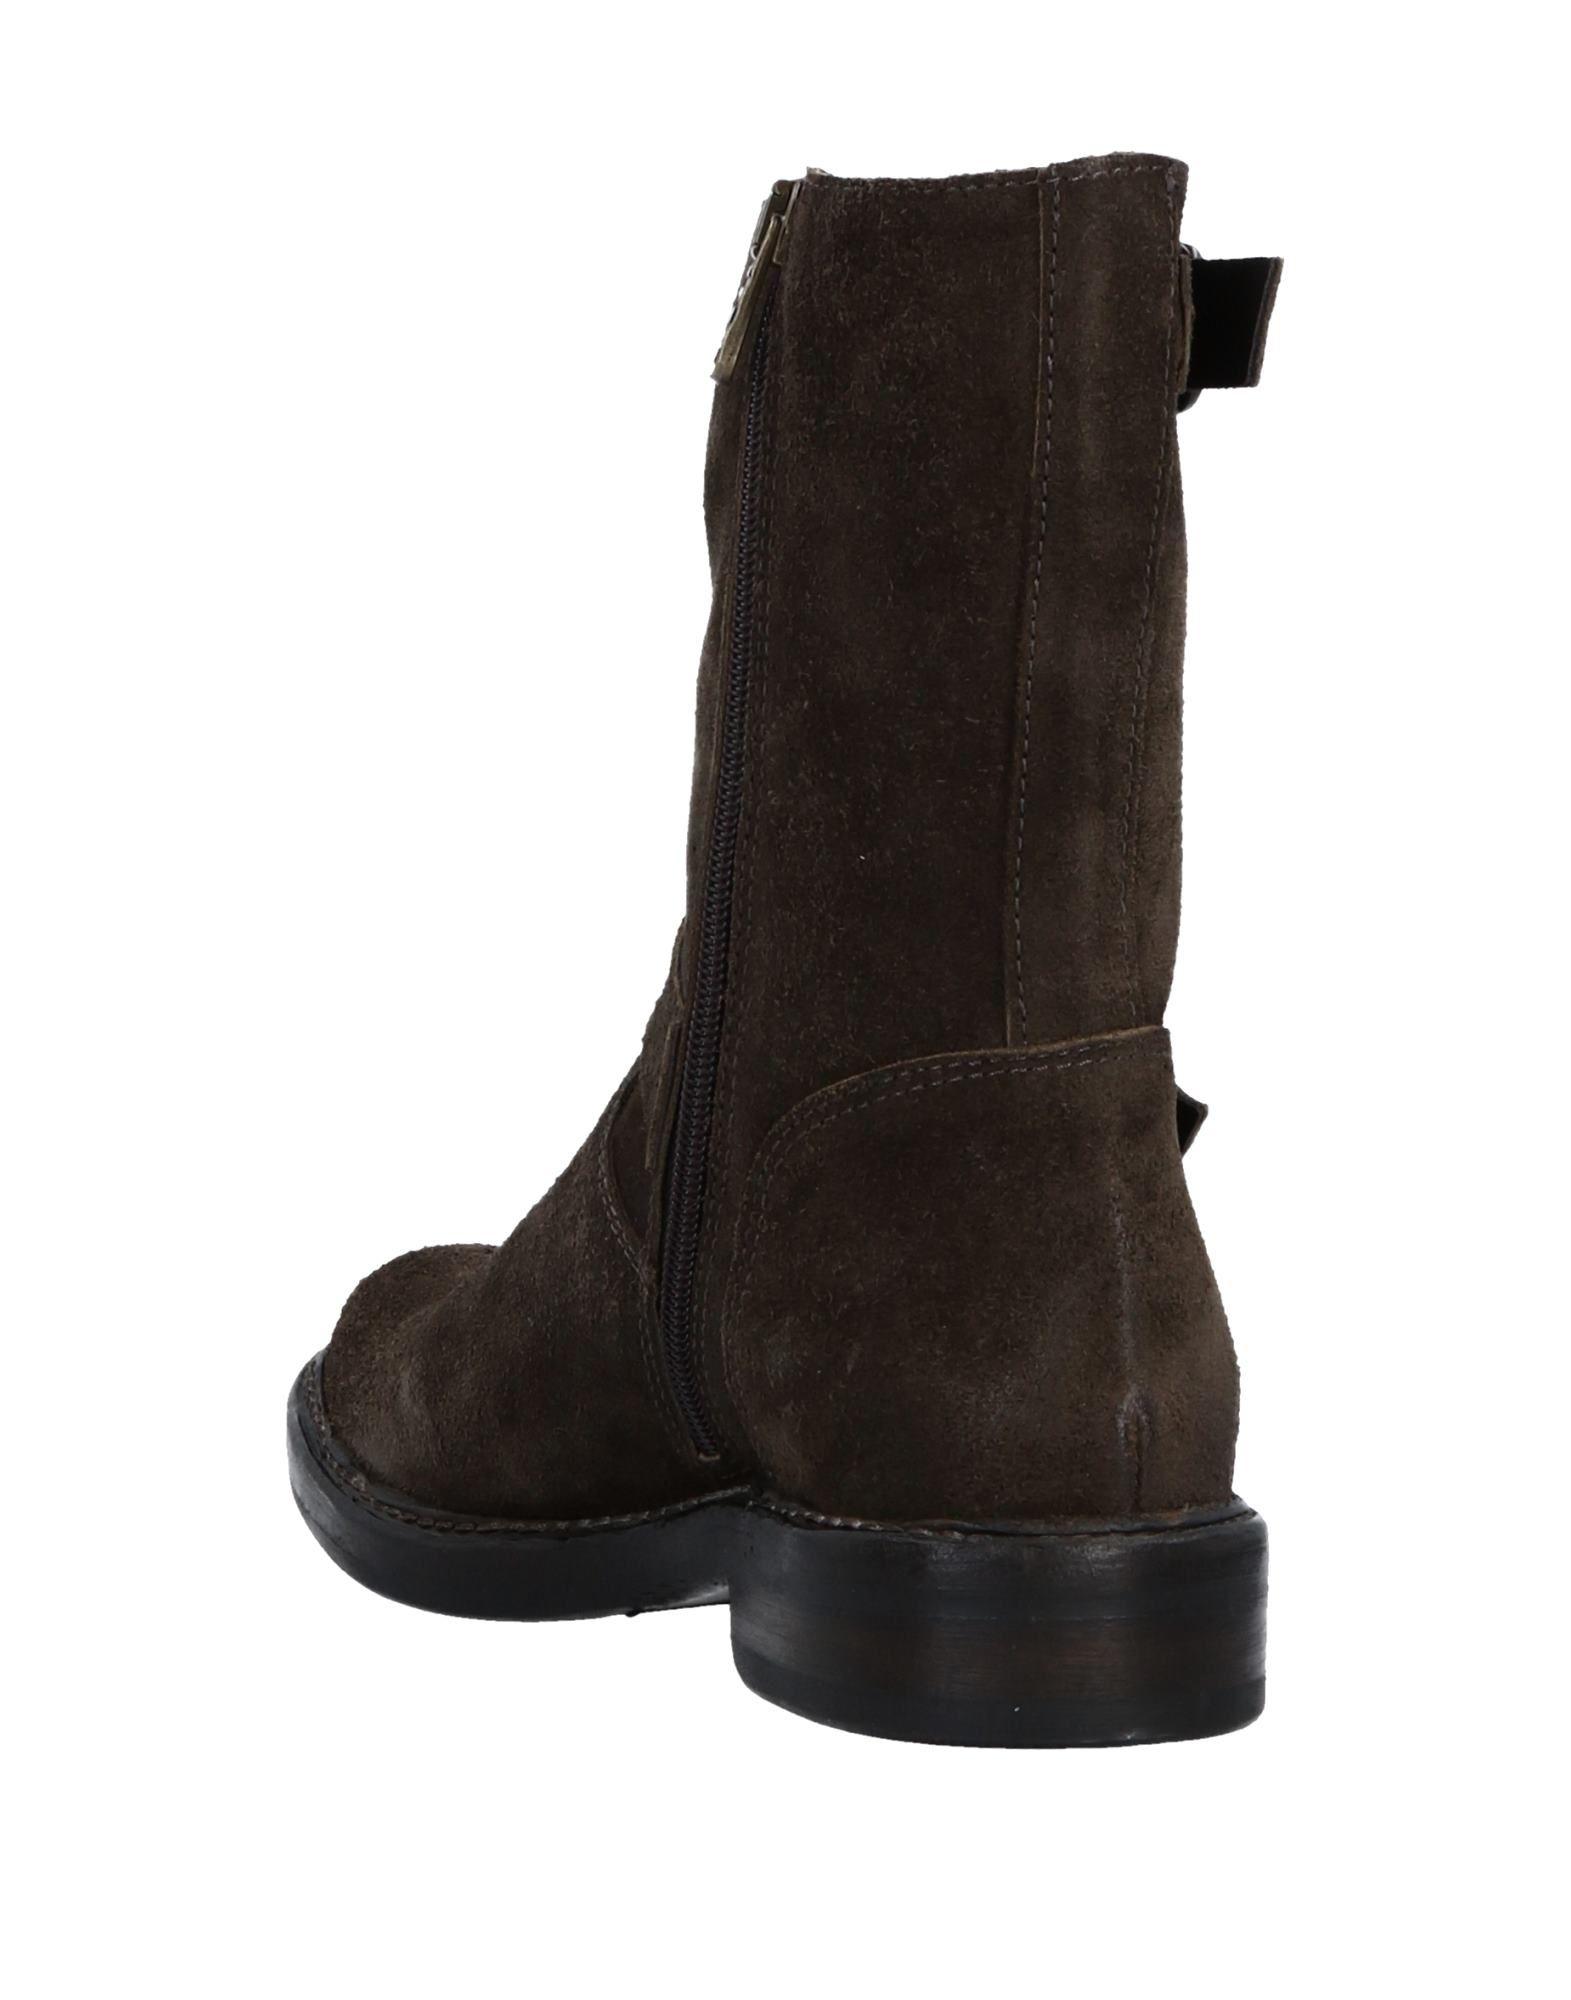 Stilvolle Stiefelette billige Schuhe Hundred 100 Stiefelette Stilvolle Damen  11516545PX 9a1a94